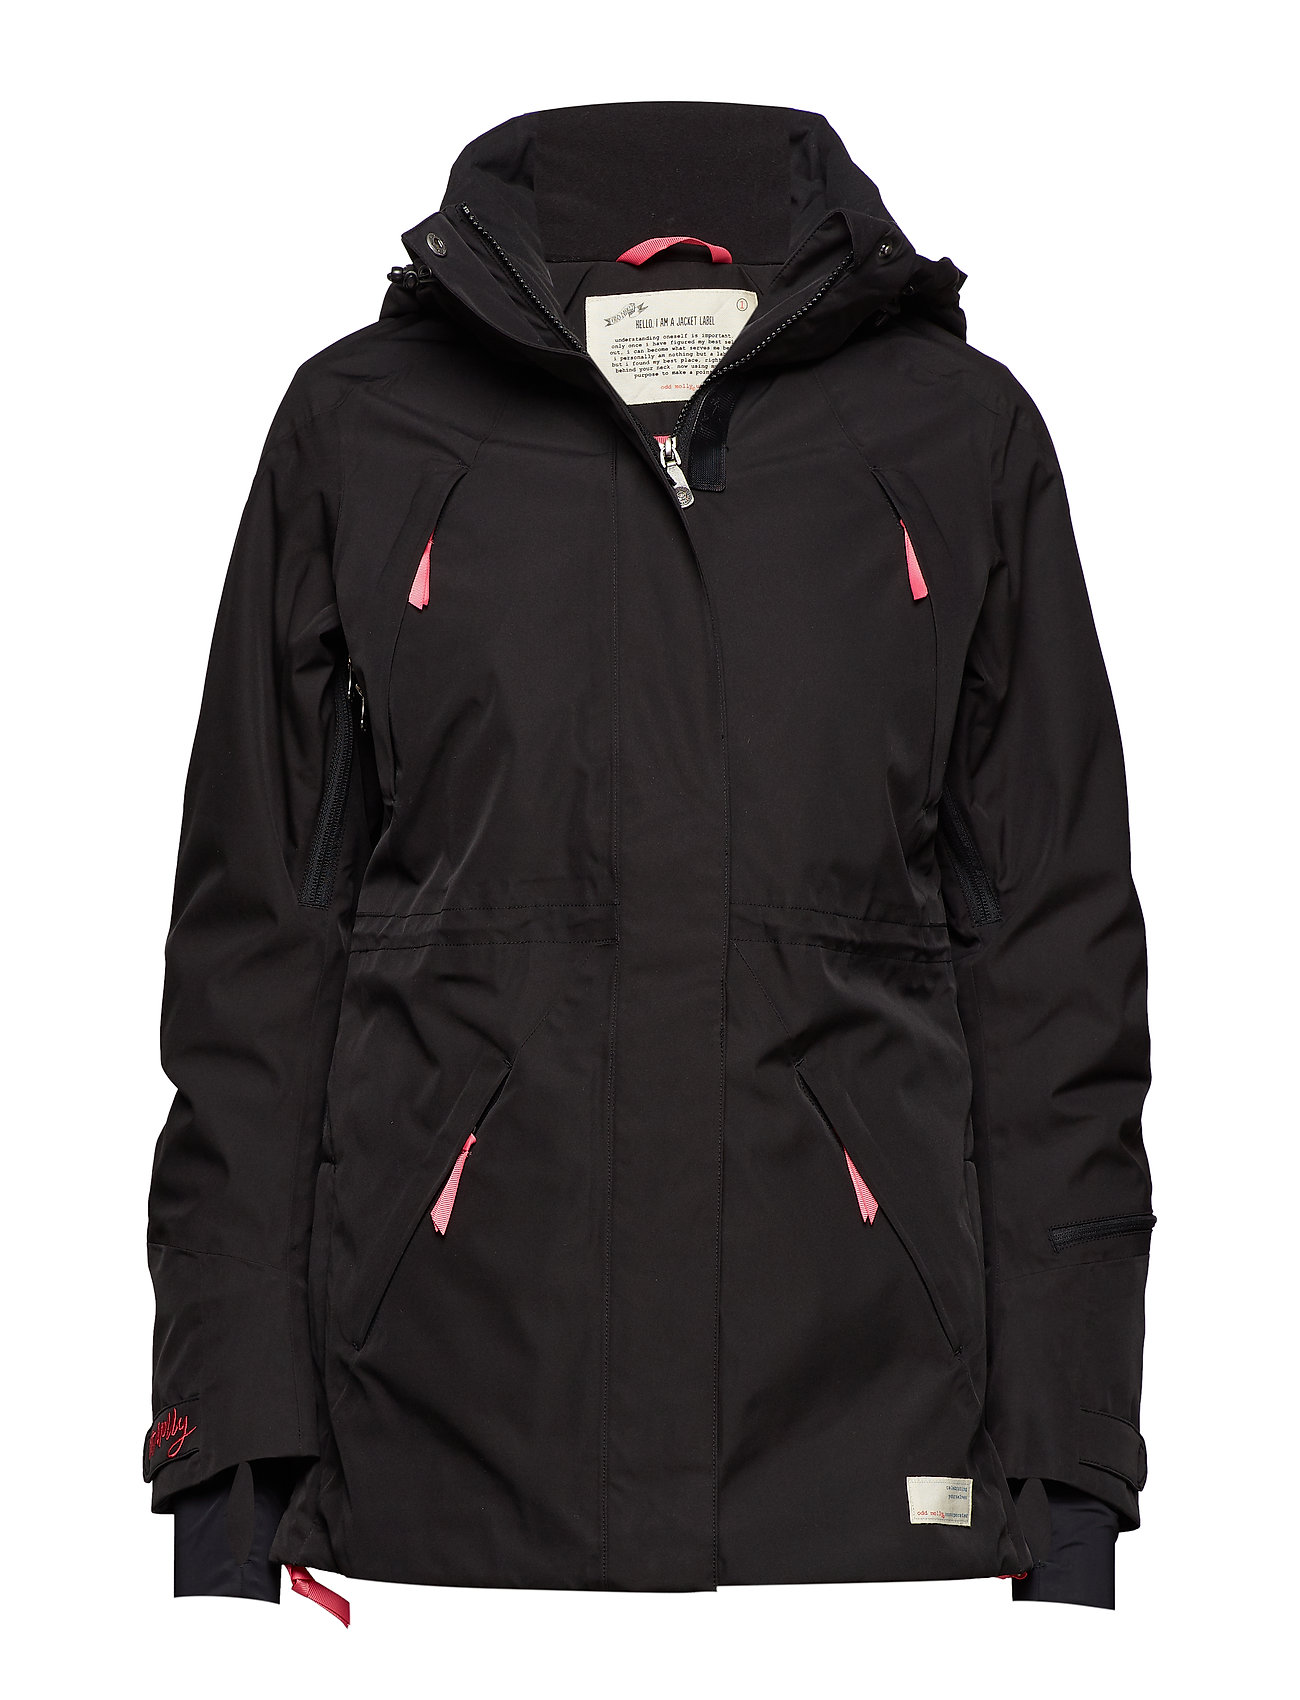 ODD MOLLY ACTIVE WEAR love-alanche jacket